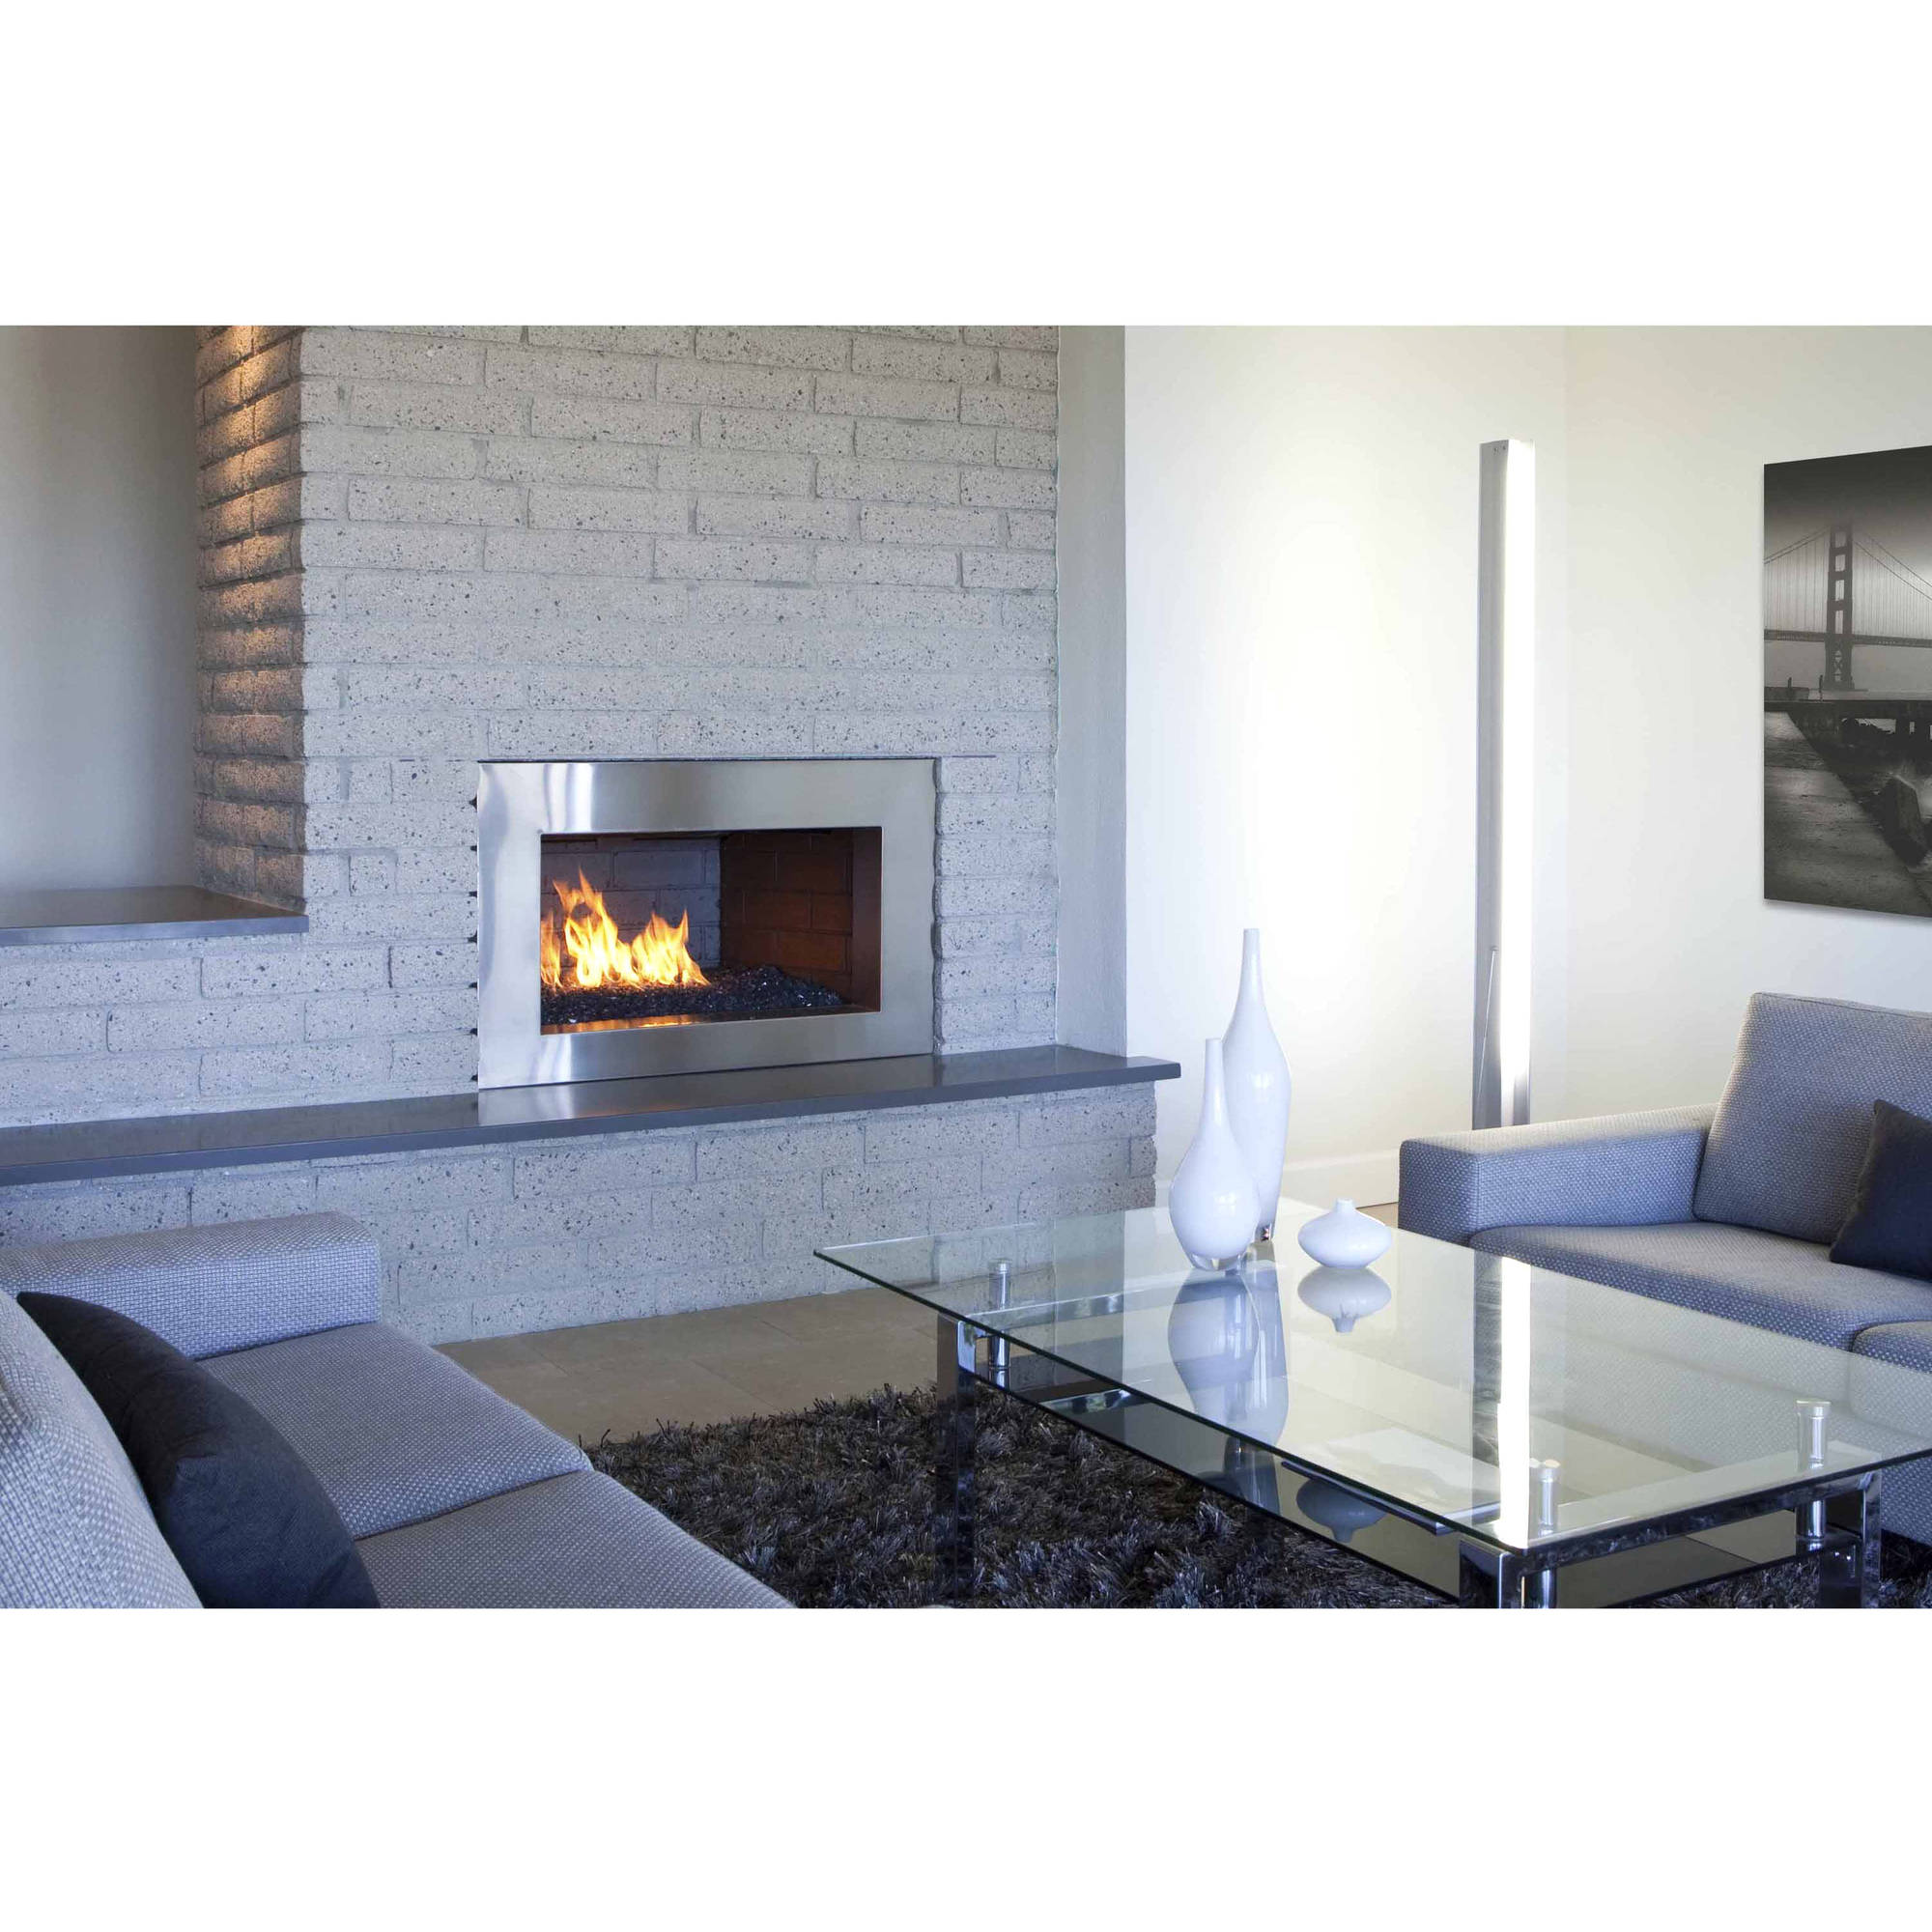 doors colorado do products comfort logs custom hearth inc we fireplace gas and fireplaces glass fireglass